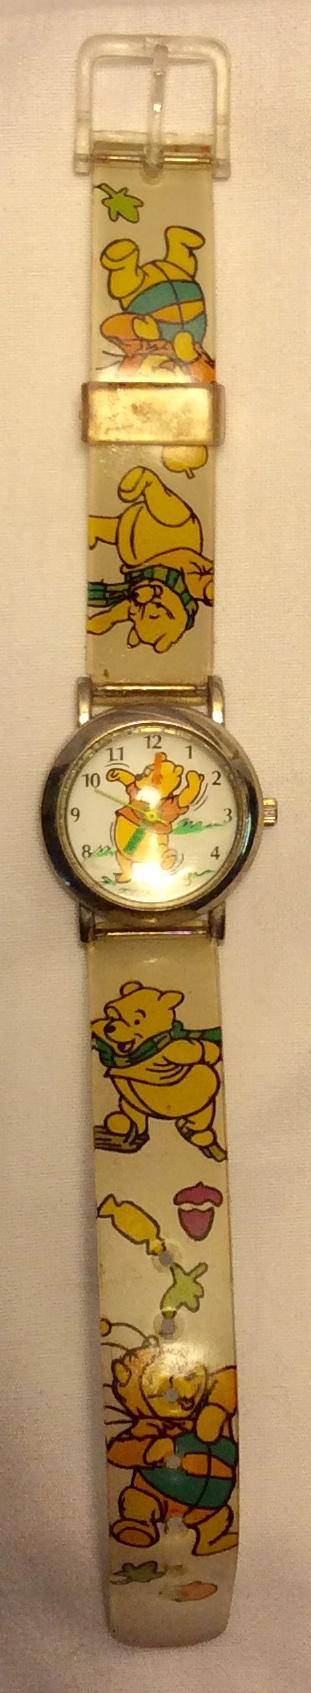 Winnie the Pooh watch